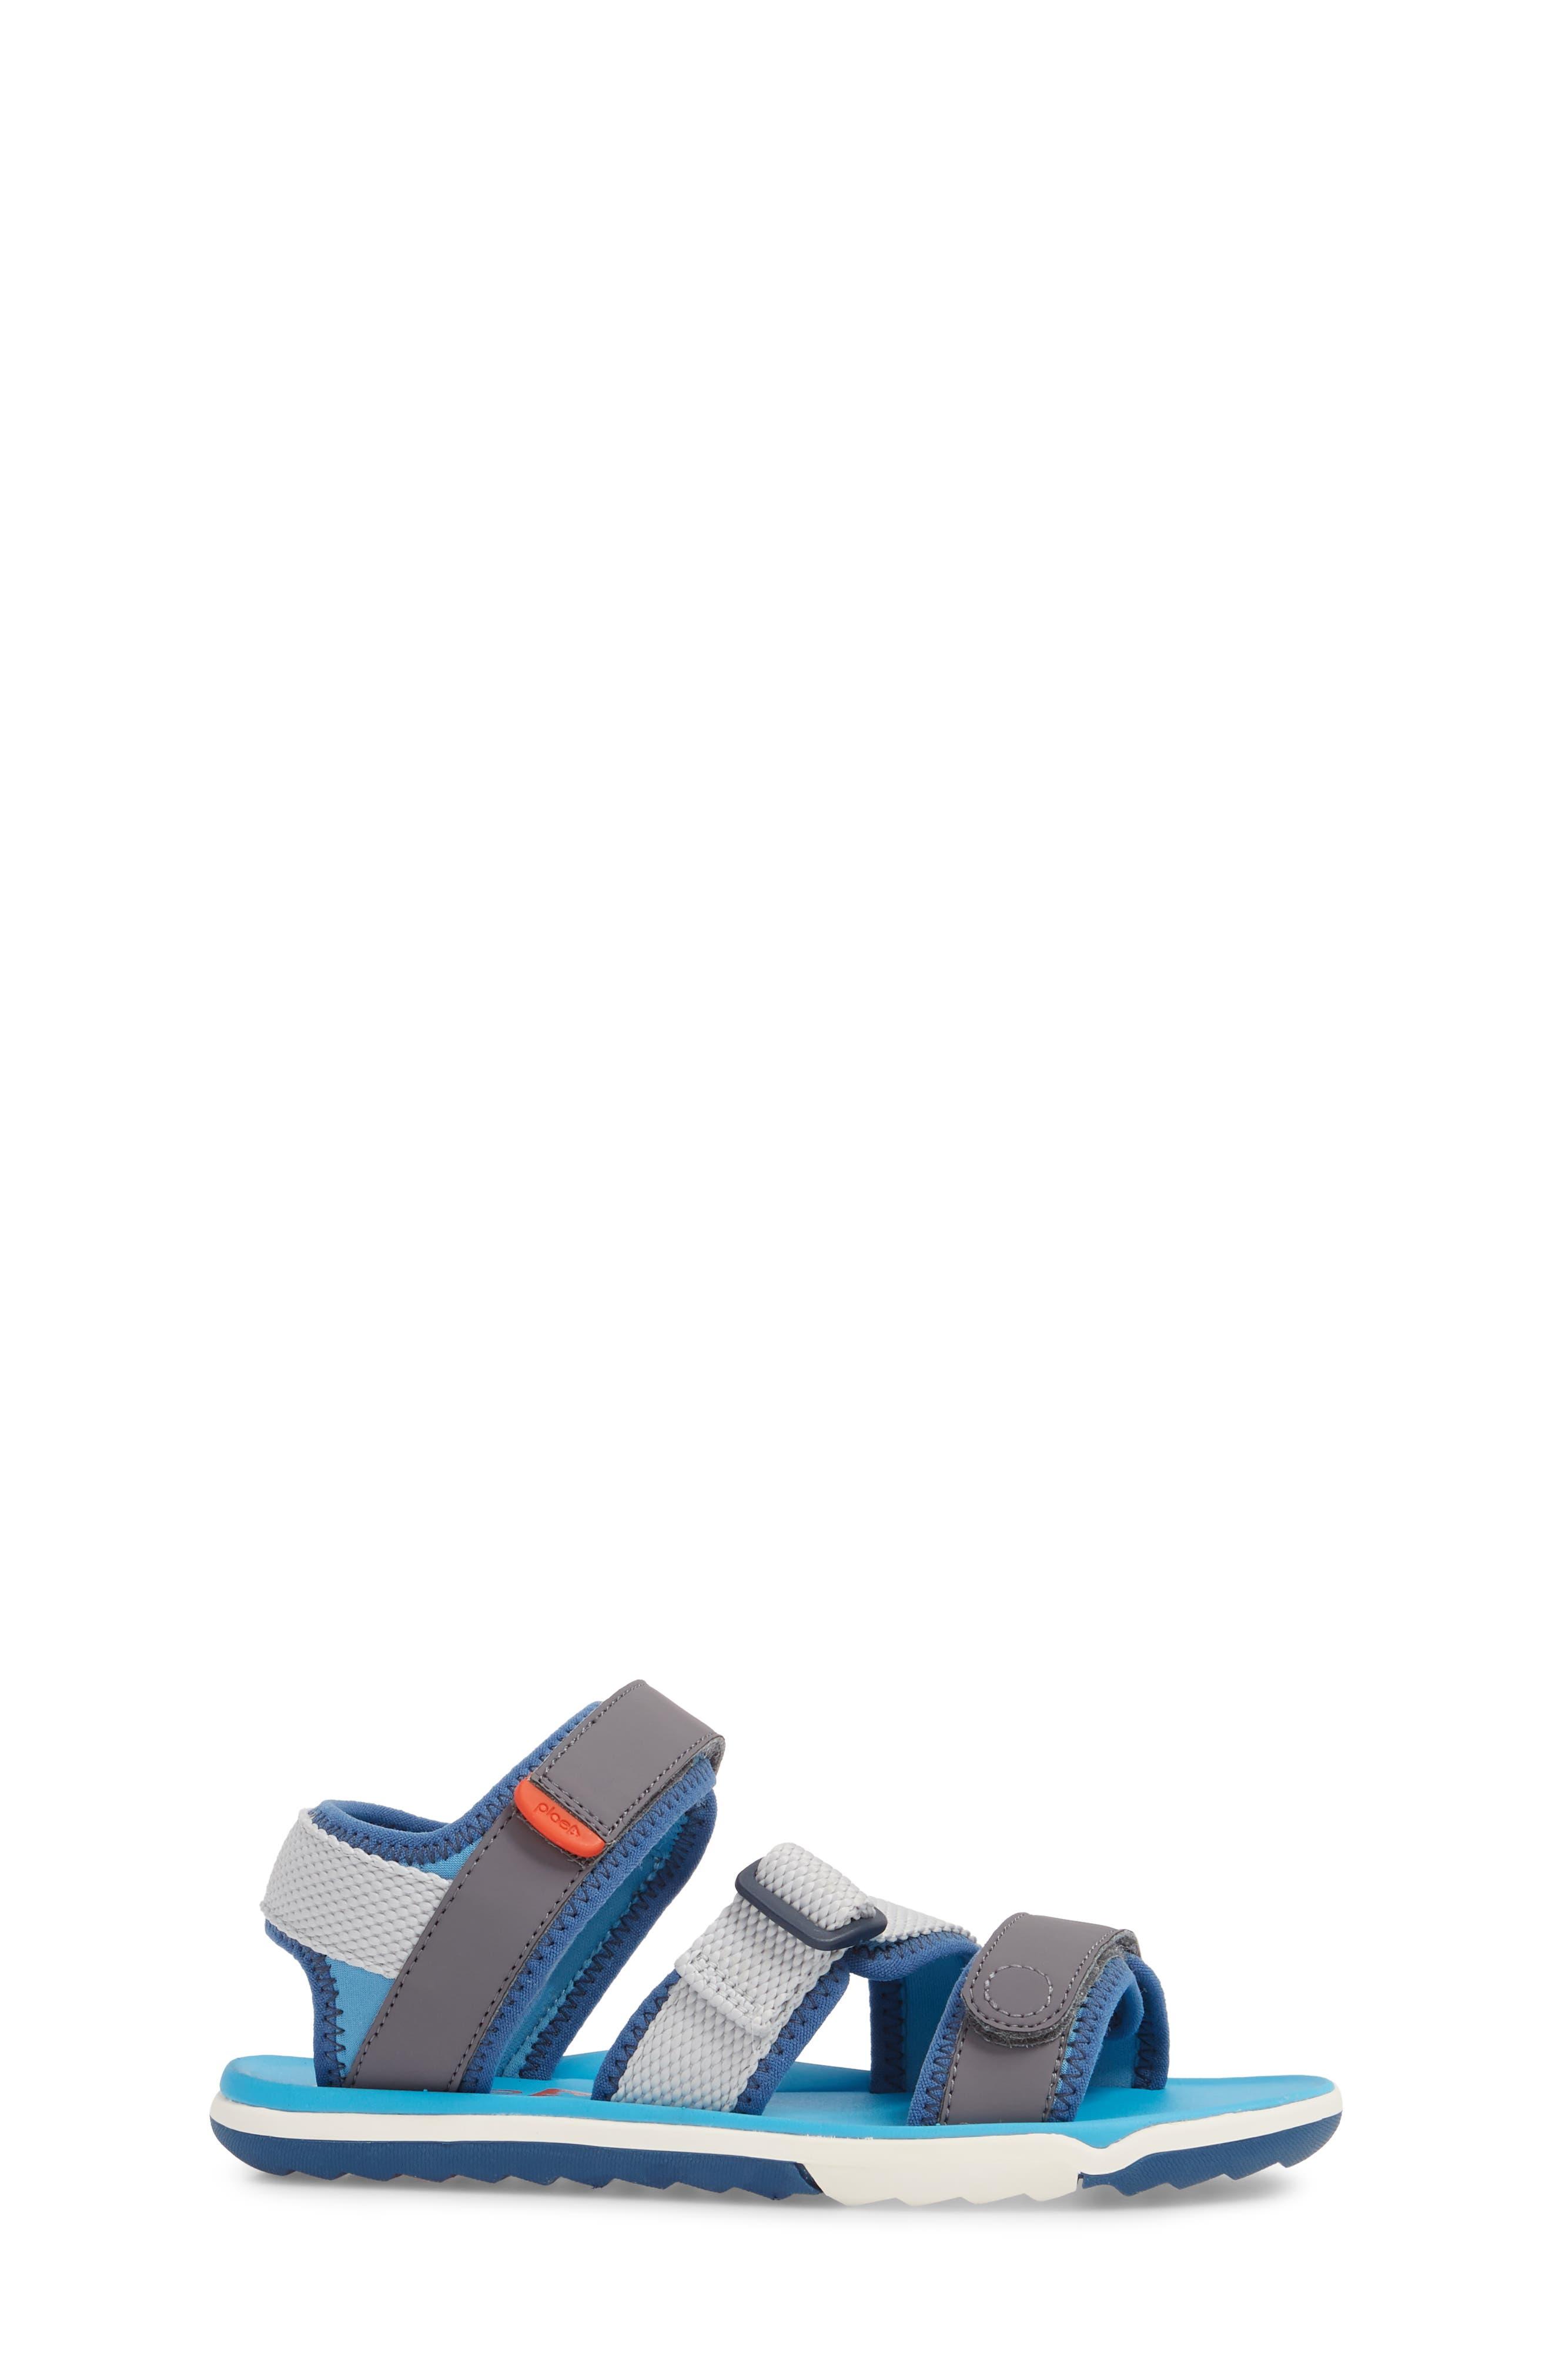 Wes Customizable Sandal,                             Alternate thumbnail 3, color,                             421